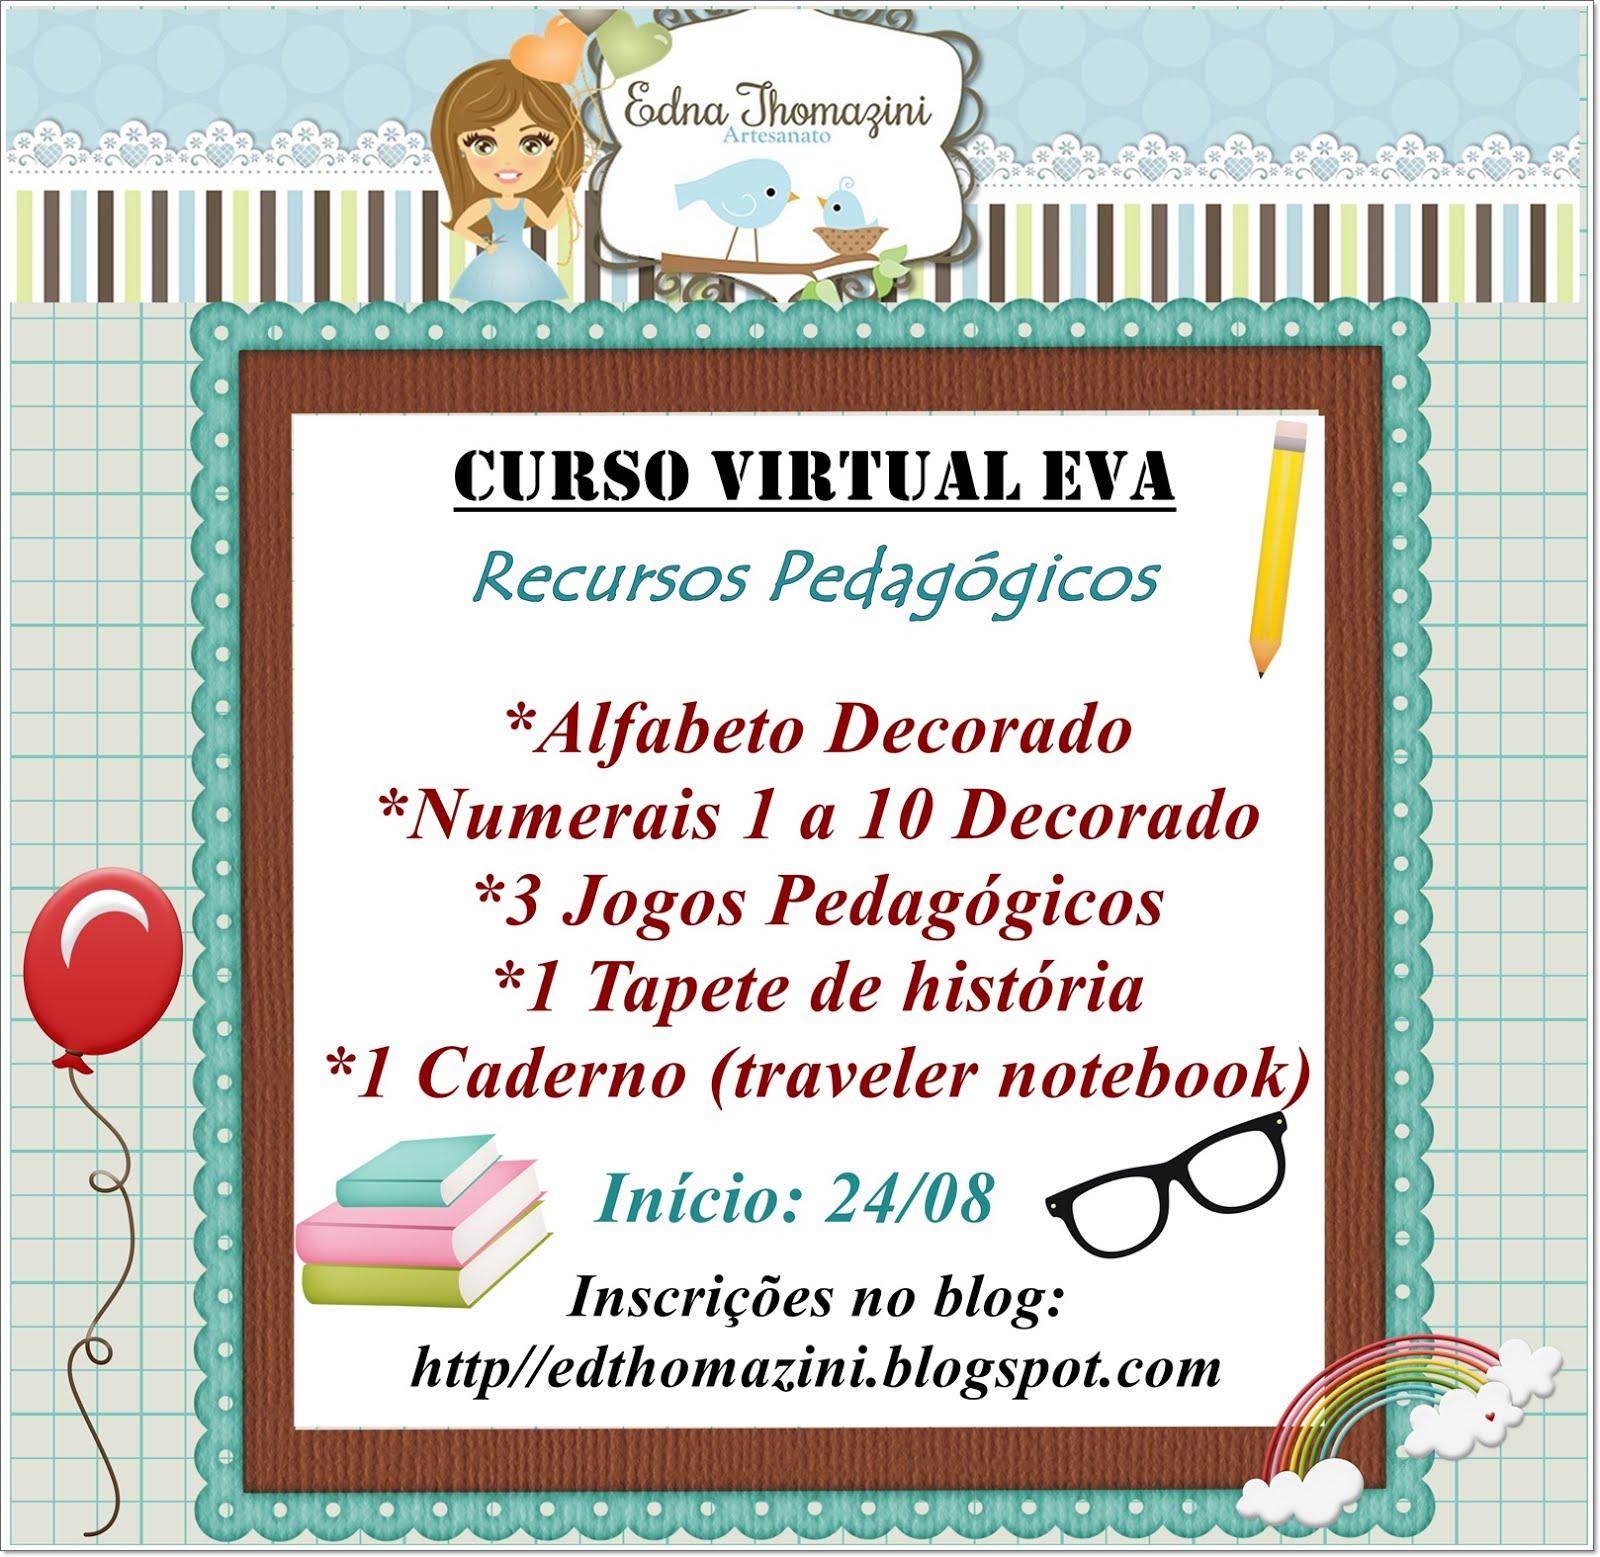 Curso Virtual EVA - Recursos Pedagógicos